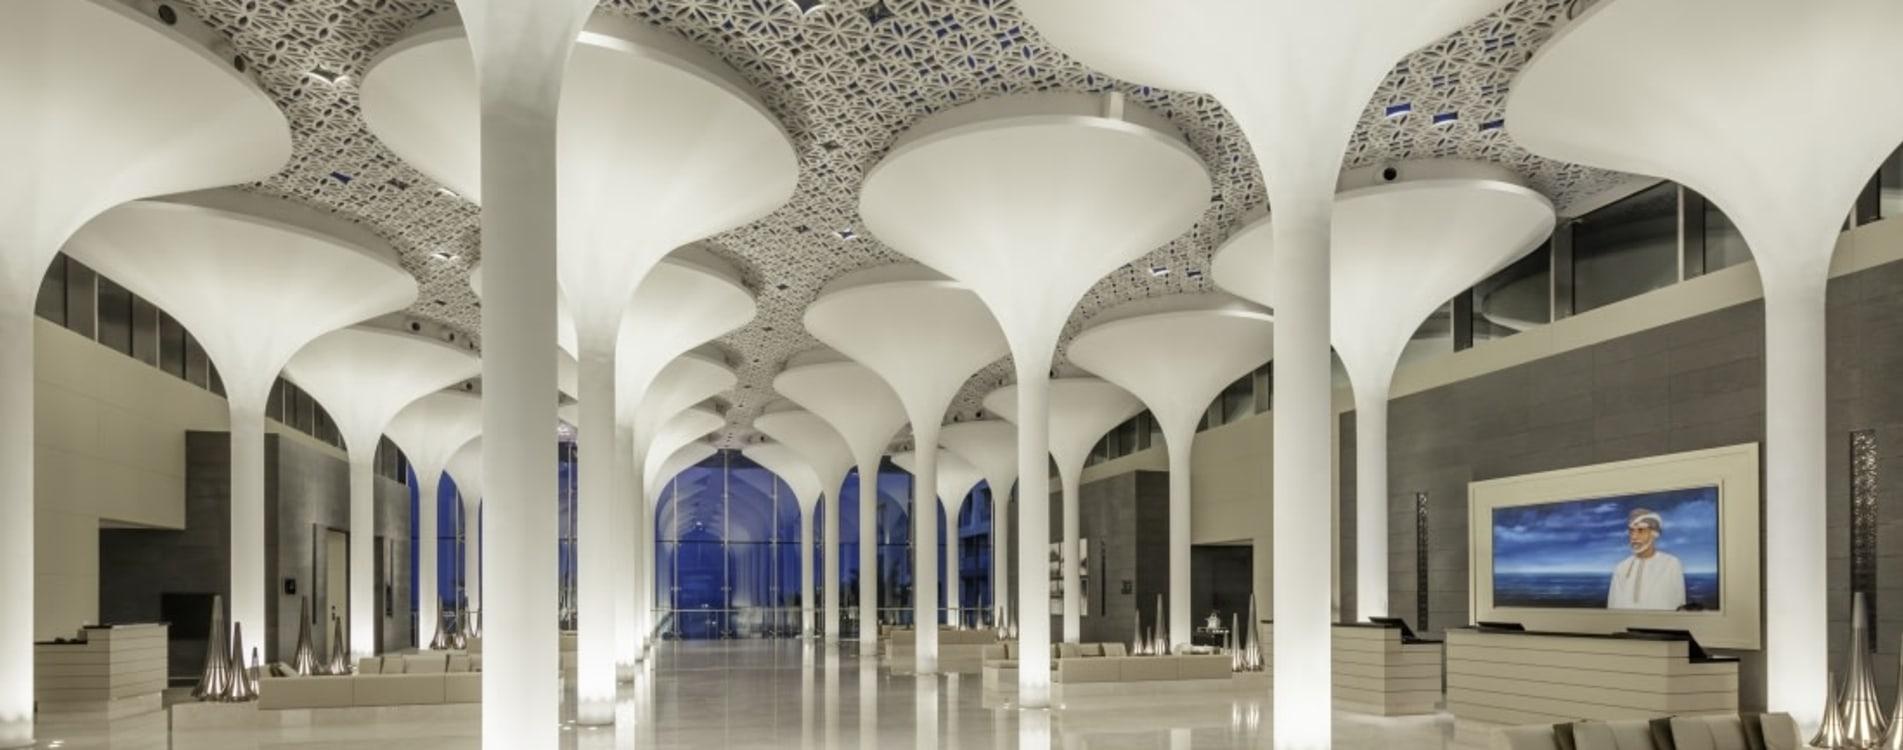 Kempinski-Hotel-Muscat-Eingangshalle-Oman.jpg